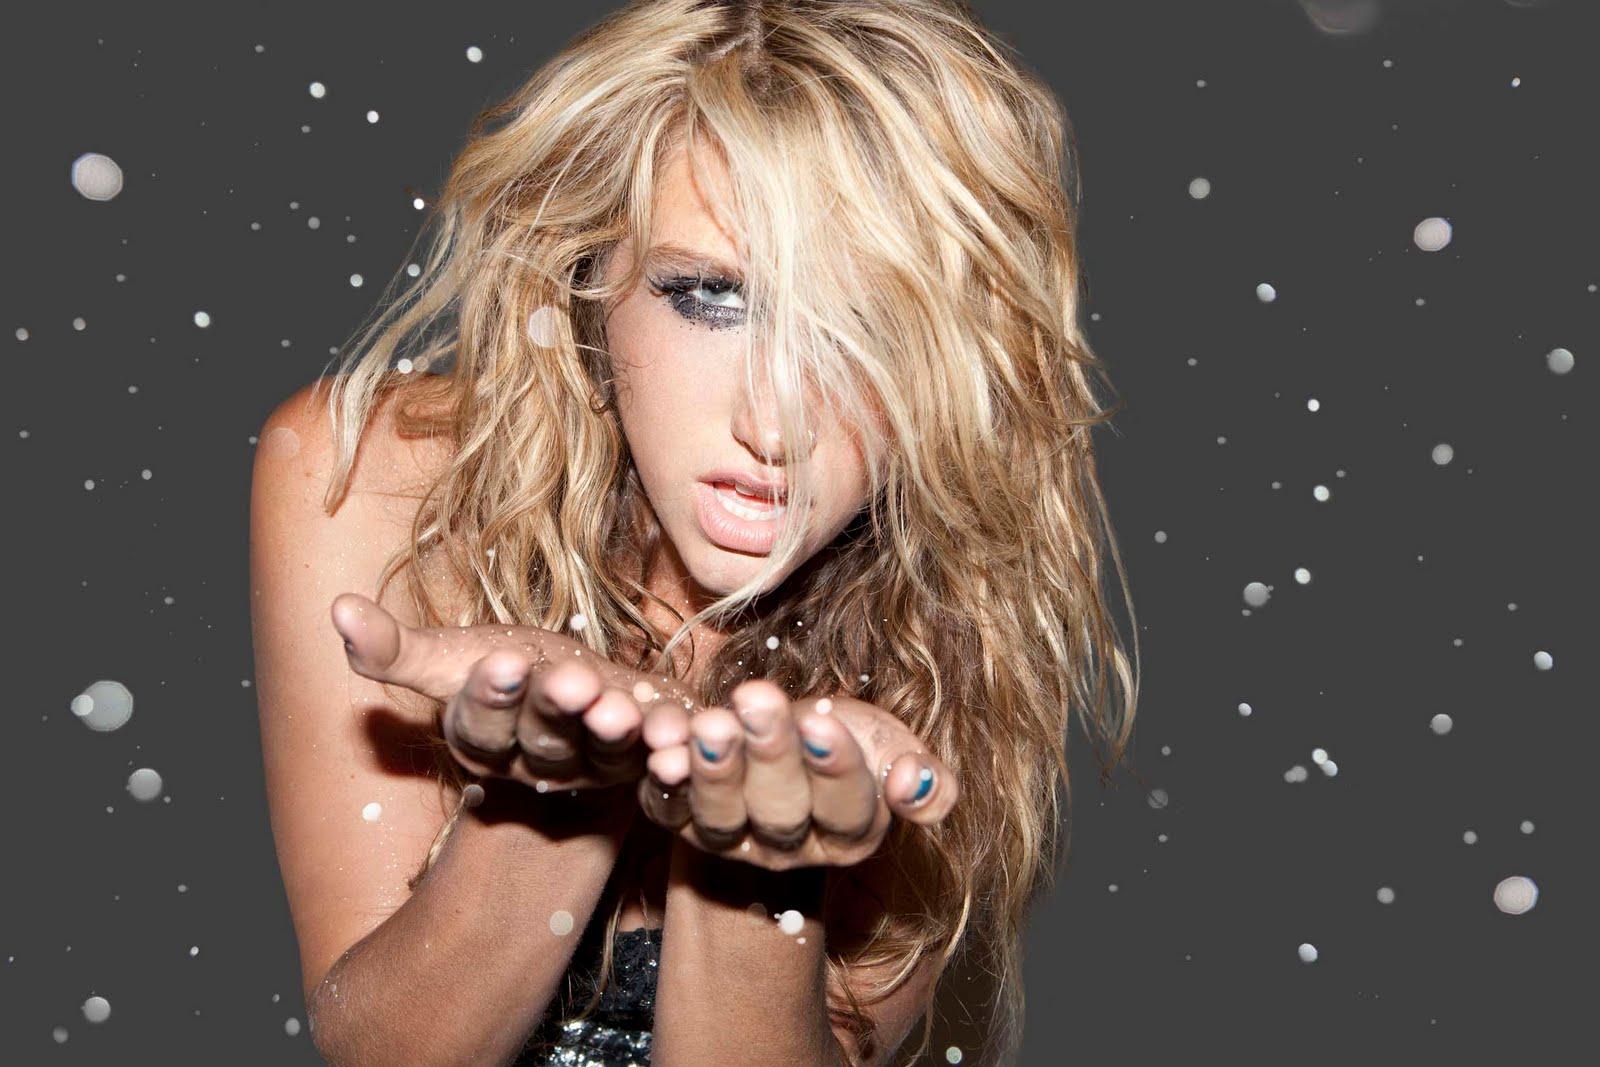 http://4.bp.blogspot.com/-NCFcfcyb9Jg/TiHDqwfpFFI/AAAAAAAAA3A/Ot6fuq-bSyM/s1600/Kesha_Glitter.jpg